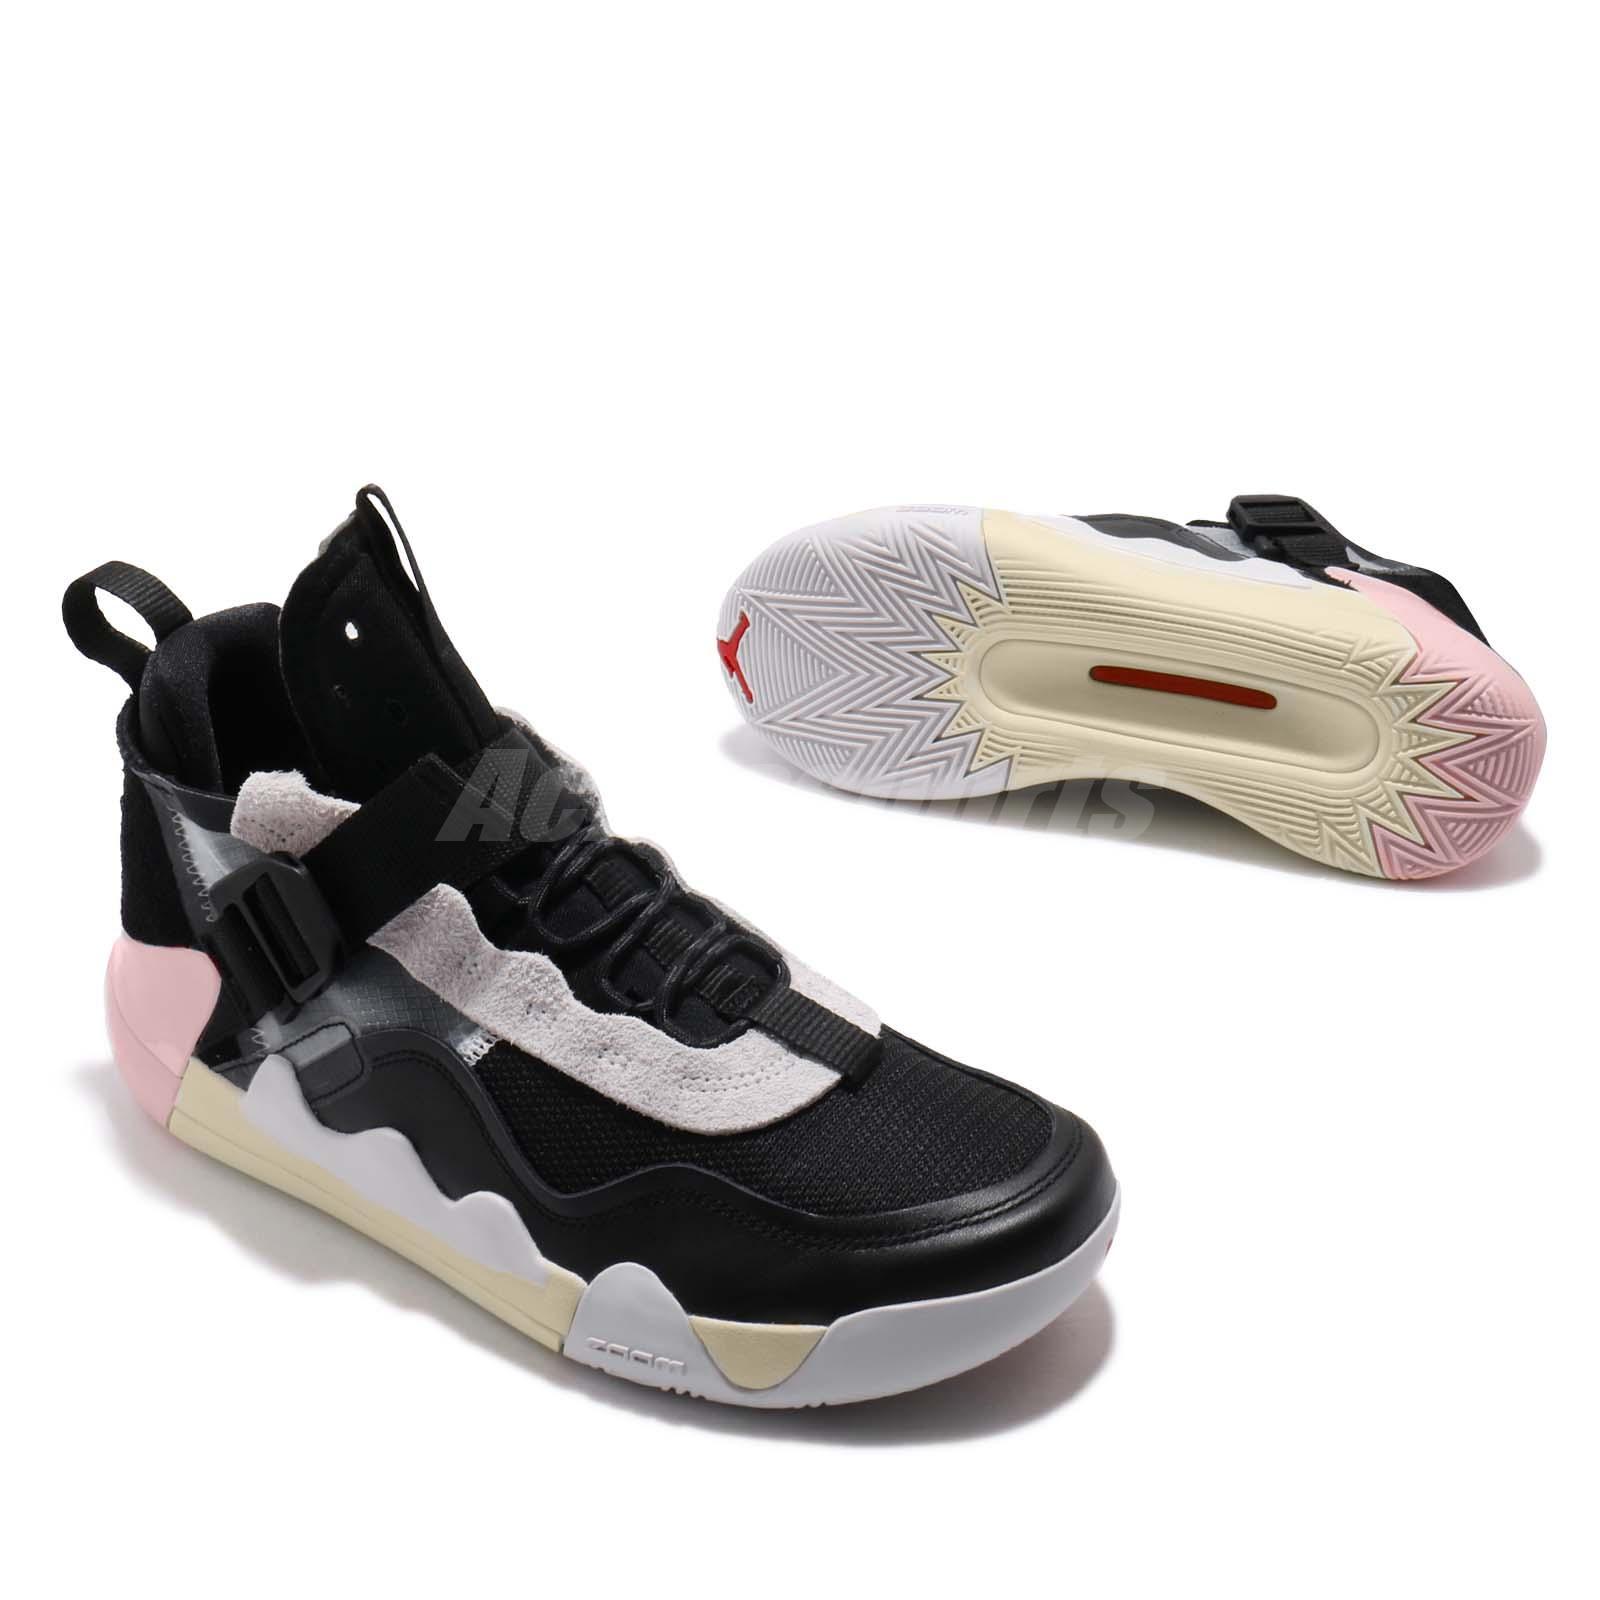 4ac39c7021 Details about Nike Jordan Defy SP Black Pink Yellow Men Basketball Shoes  Sneakers CJ7698-001